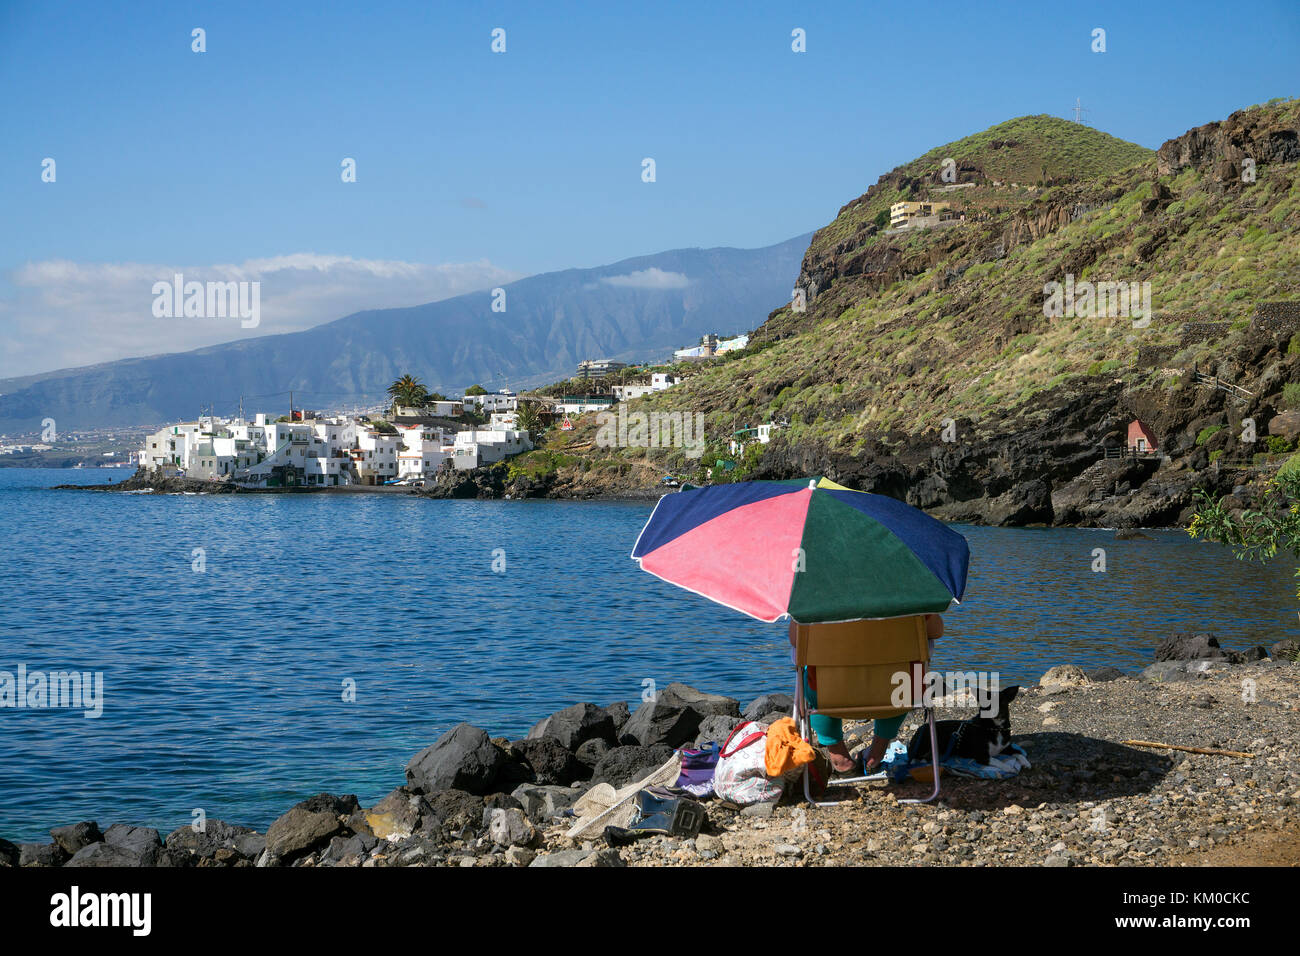 The small fishing village El Varadero at Tabaiba, nort-east of island, Tenerife island, Canary islands, Spain - Stock Image